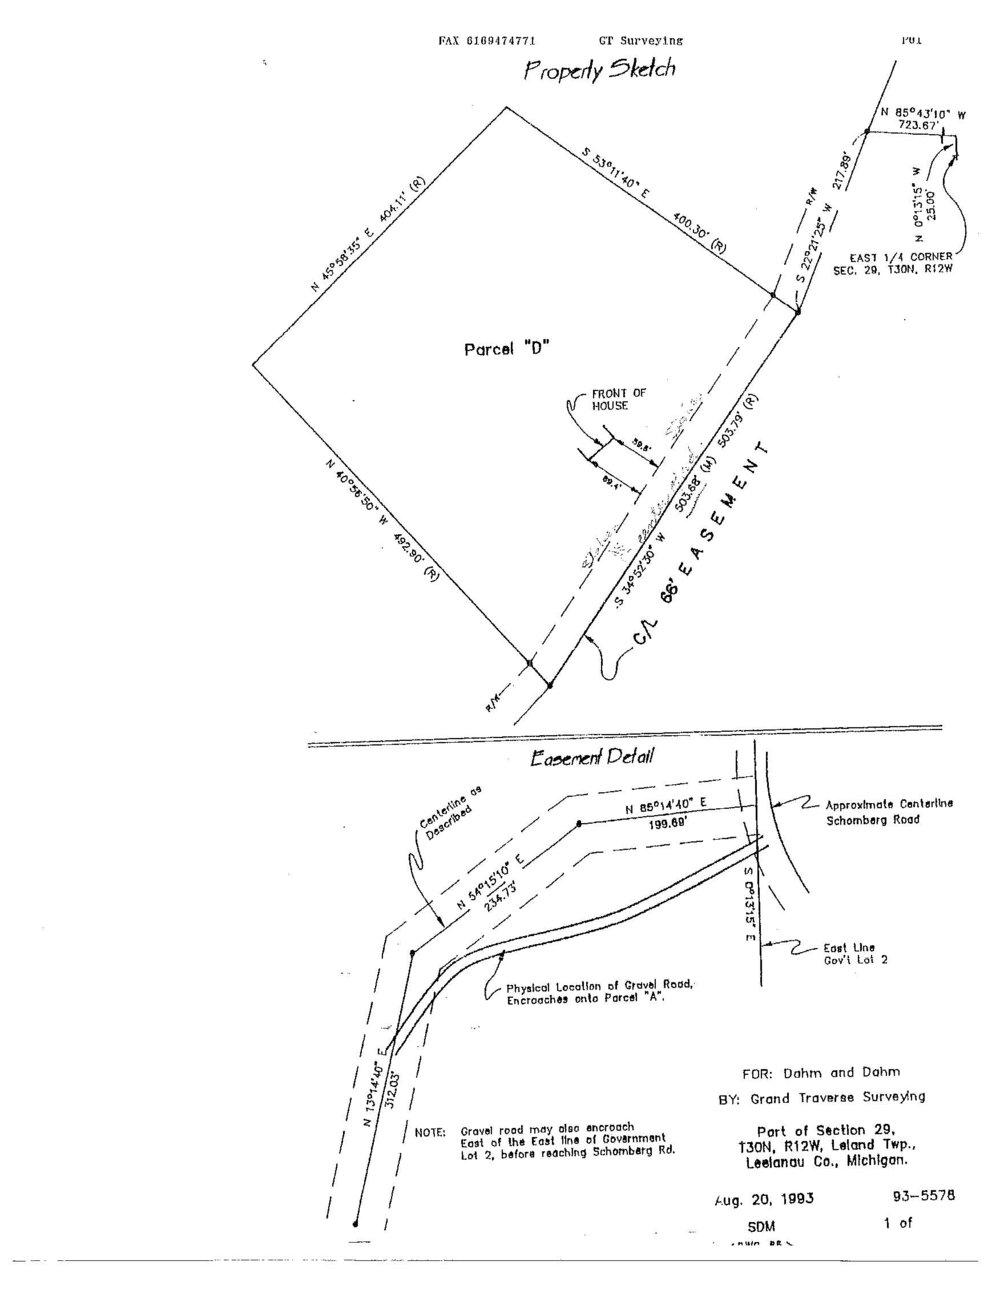 564 S Woodsmoke Drive, Lake Leelanau, MI – Sunset Lake Michigan Water Views - For Sale by Oltersdorf Realty - Marketing Packet (10).jpg